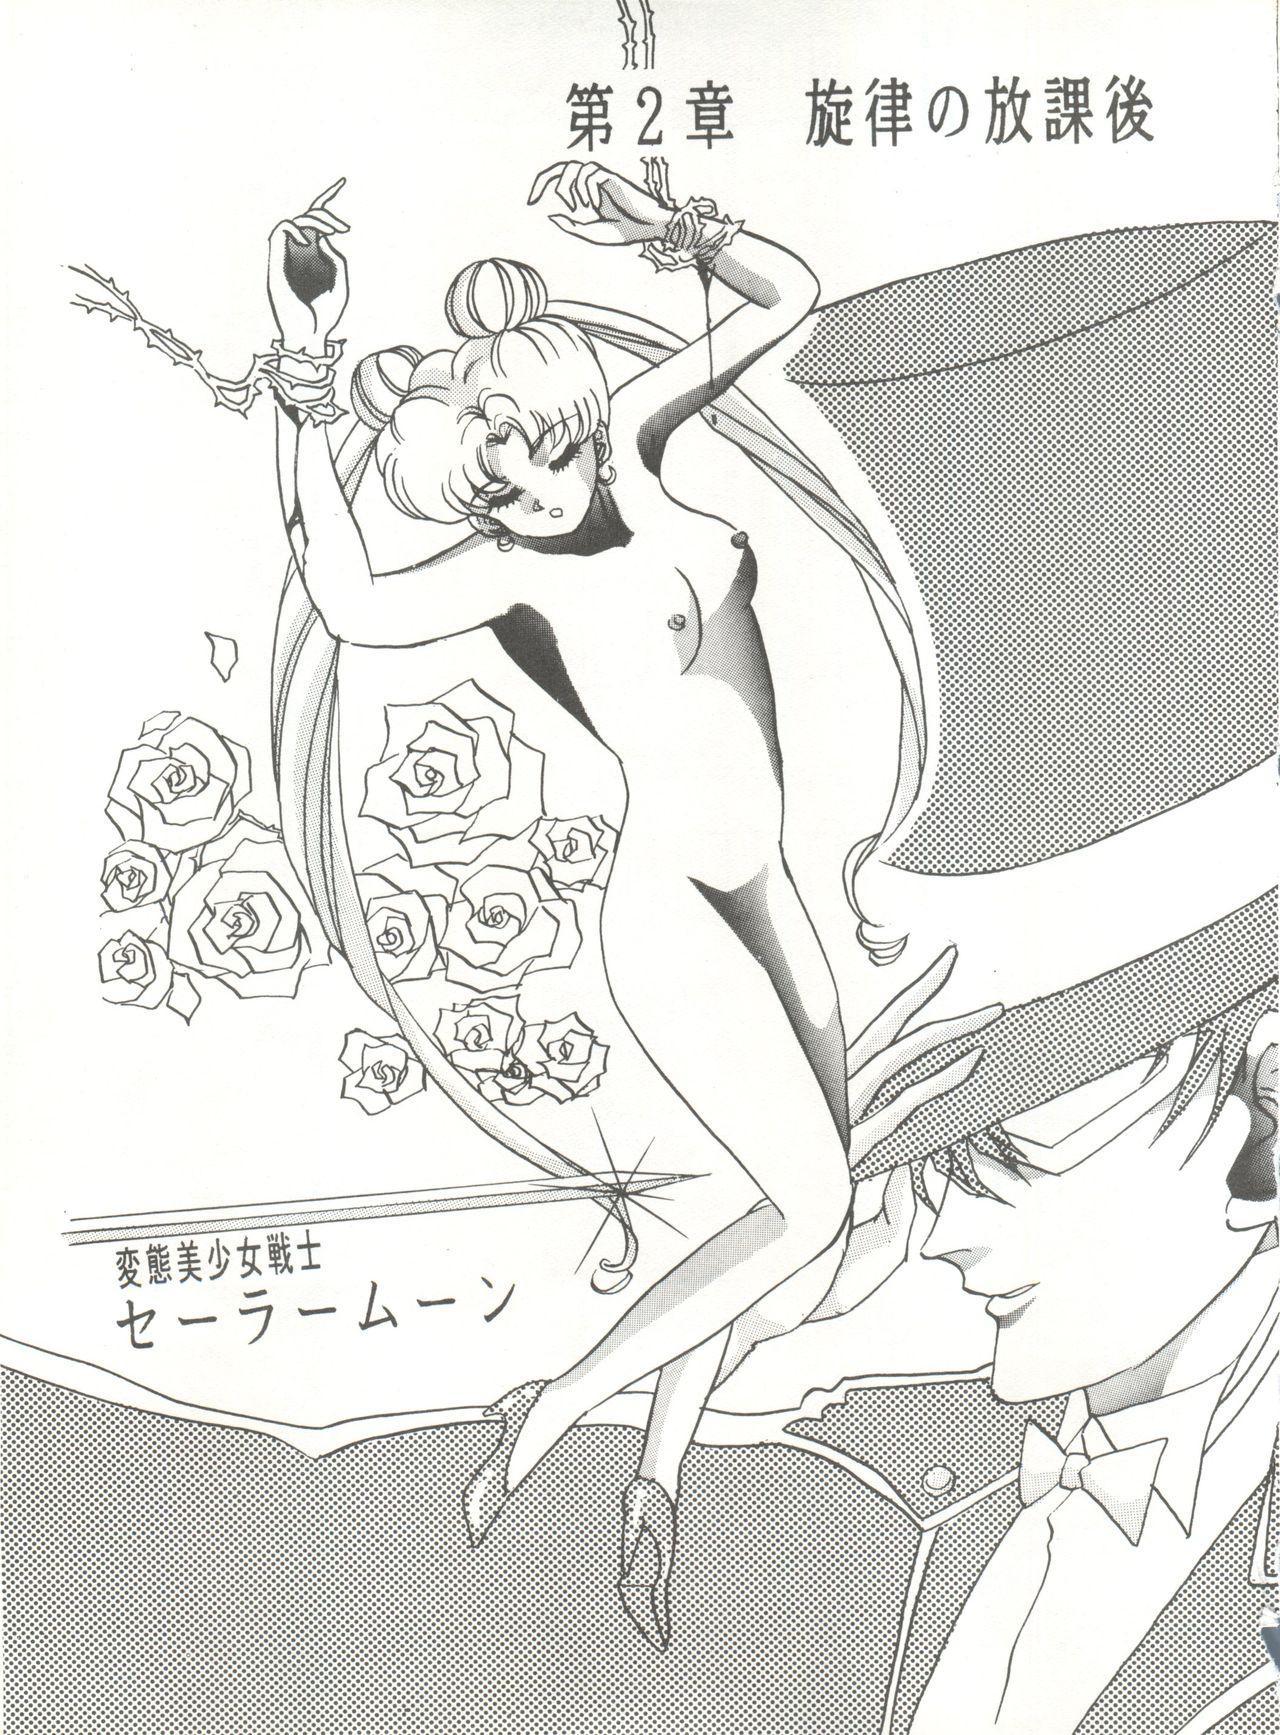 [Global One (MARO)] Sadistic 5 (Cutey Honey, Devilman, Sailor Moon), [Global One (MARO)] Sadistic (Dirty Pair, Fushigi no Umi no Nadia, Sailor Moon), [Studio Ikkatsumajin] .ribbon (Hime-chan's Ribbon) 44